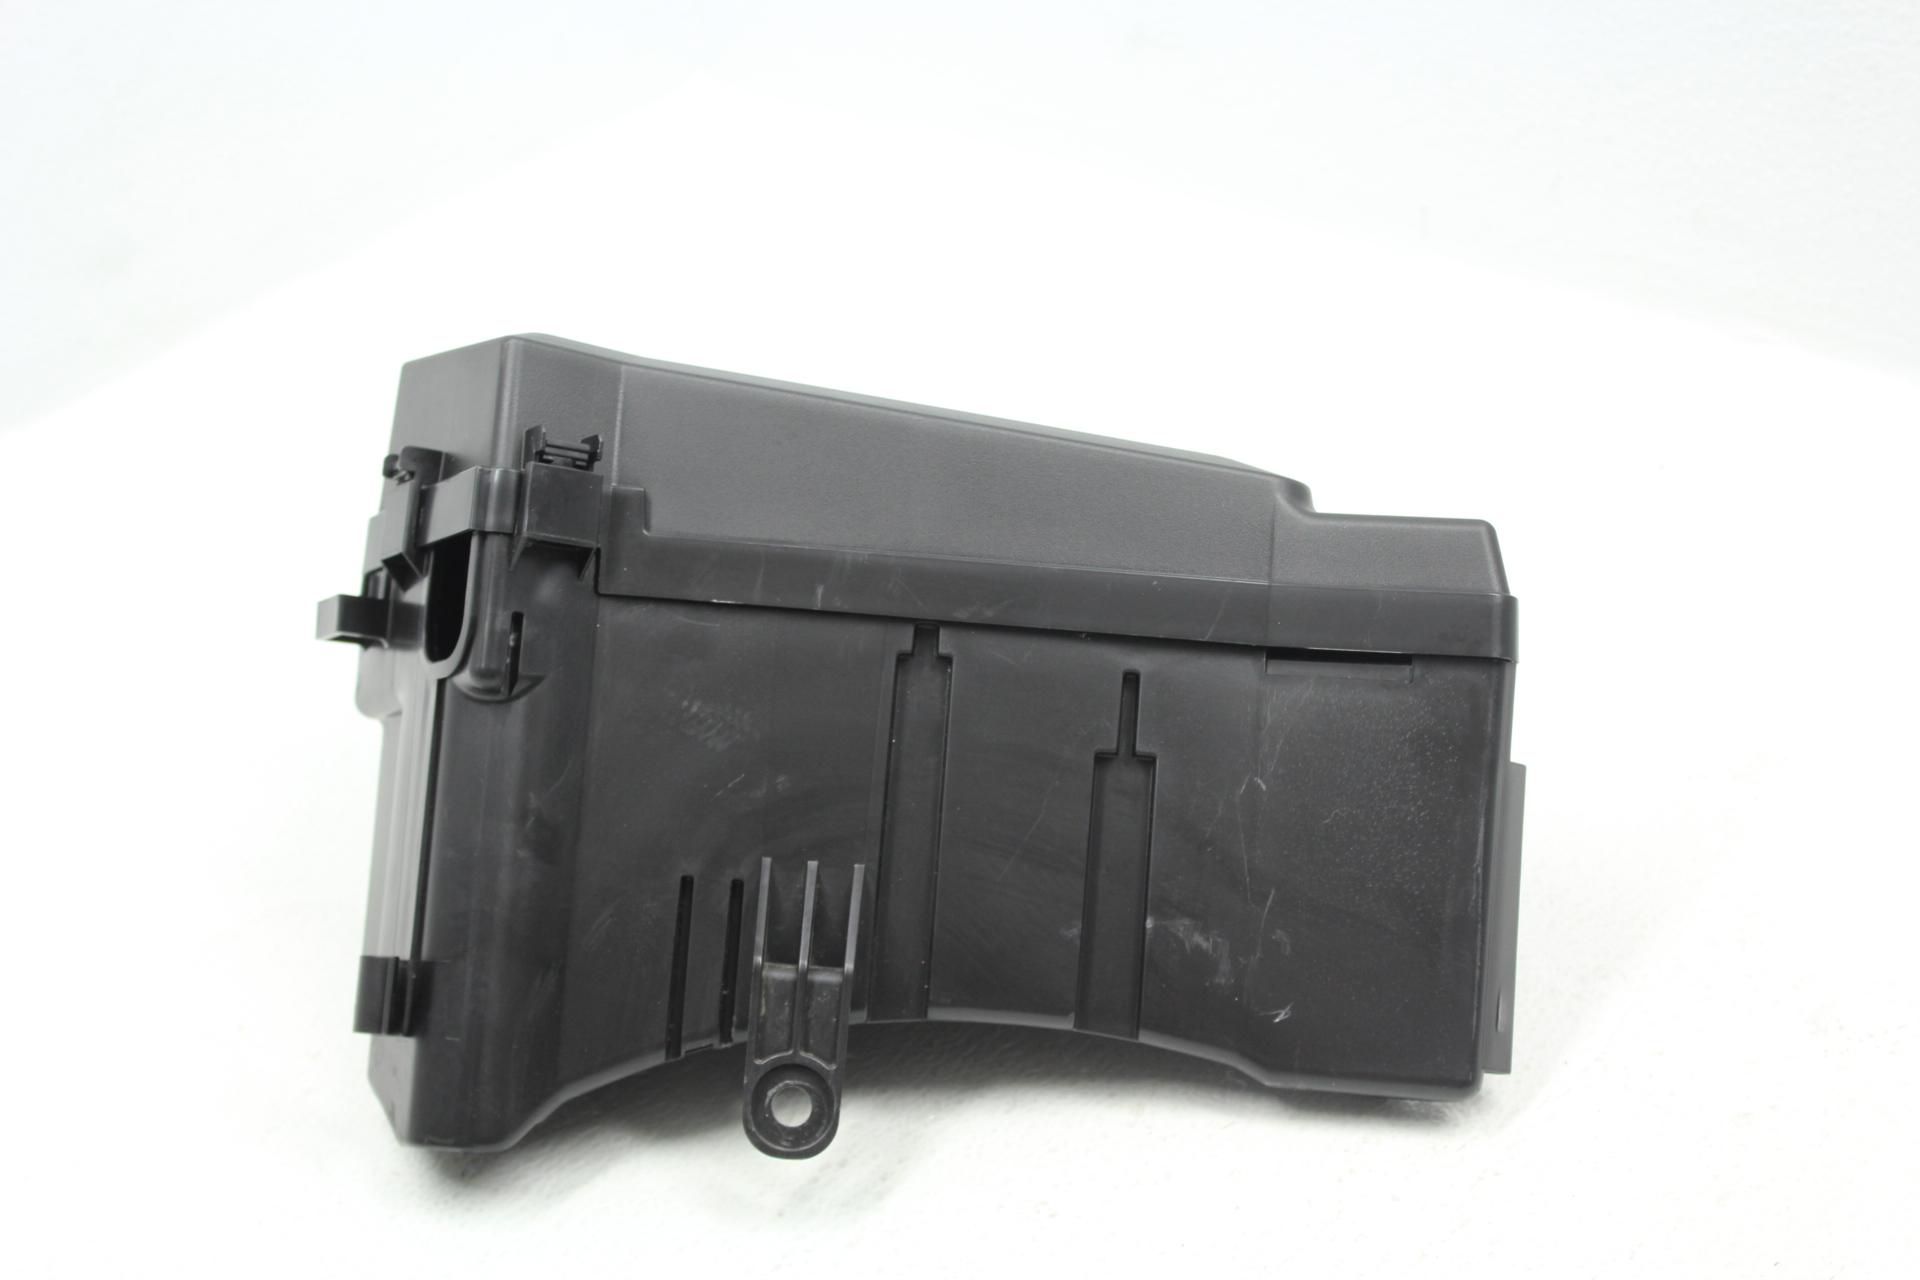 18 2018 Subaru Wrx Sti Type Ra Fuse Box Panel Cover Oem 82243va010